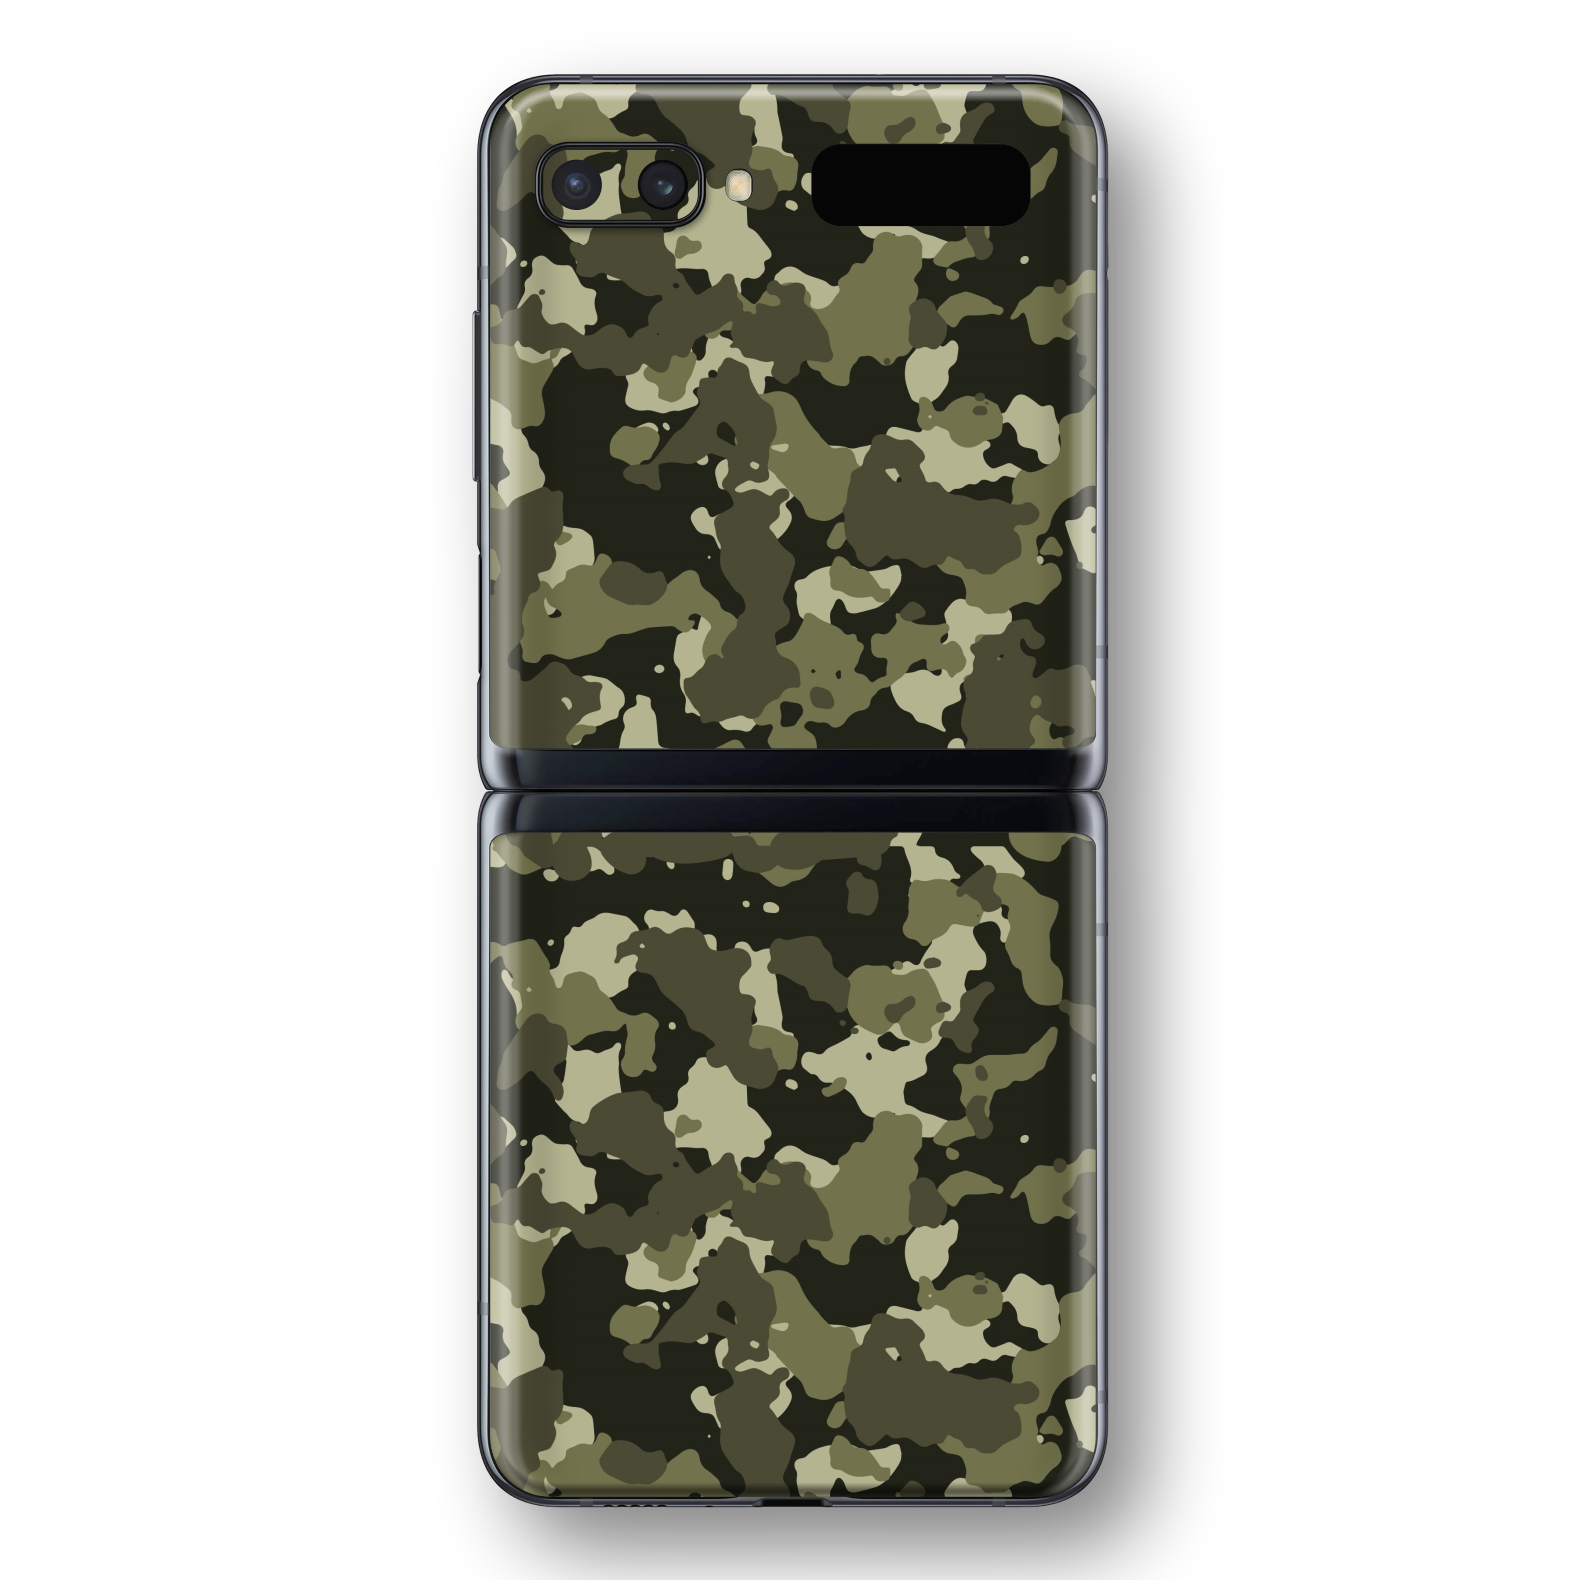 Samsung Galaxy Z Flip SIGNATURE JUNGLE Camo Skin